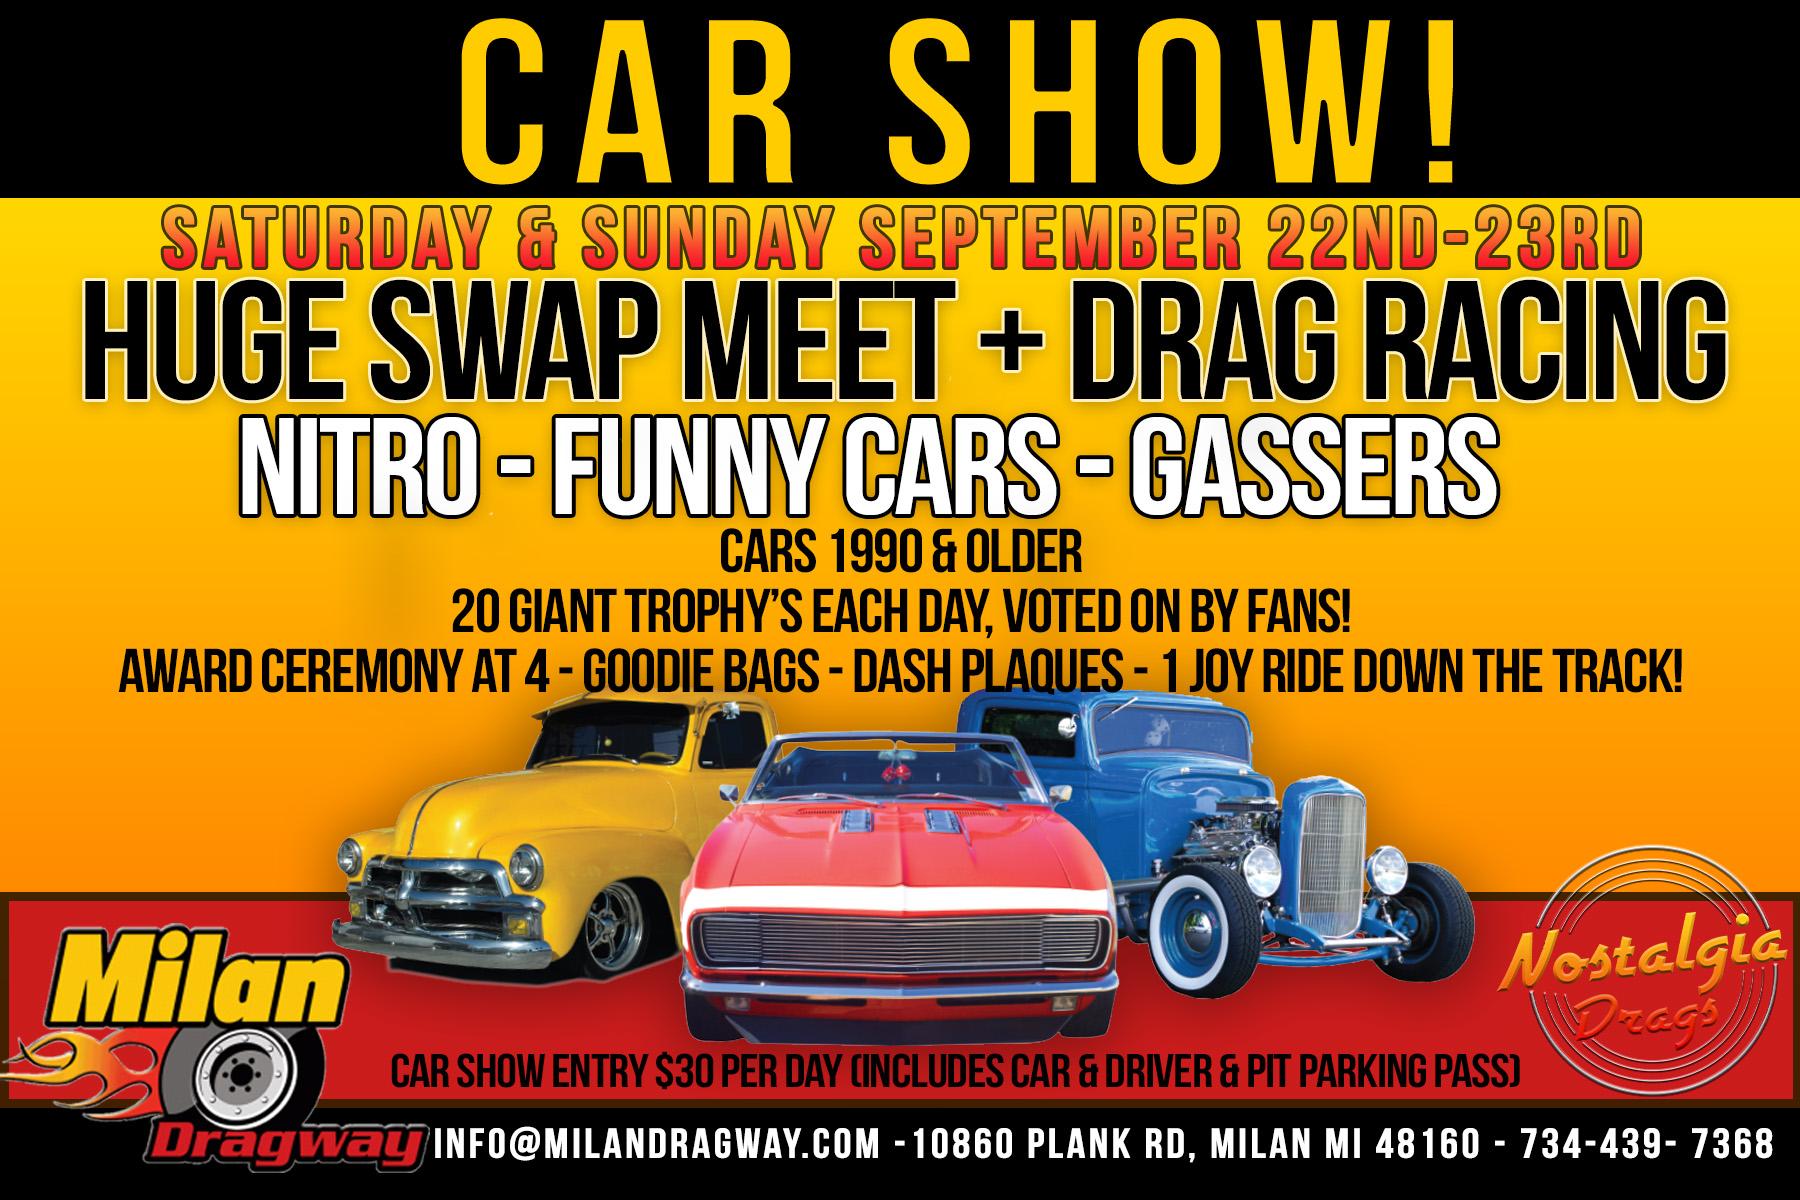 2018 Car Show Rave Card .jpg